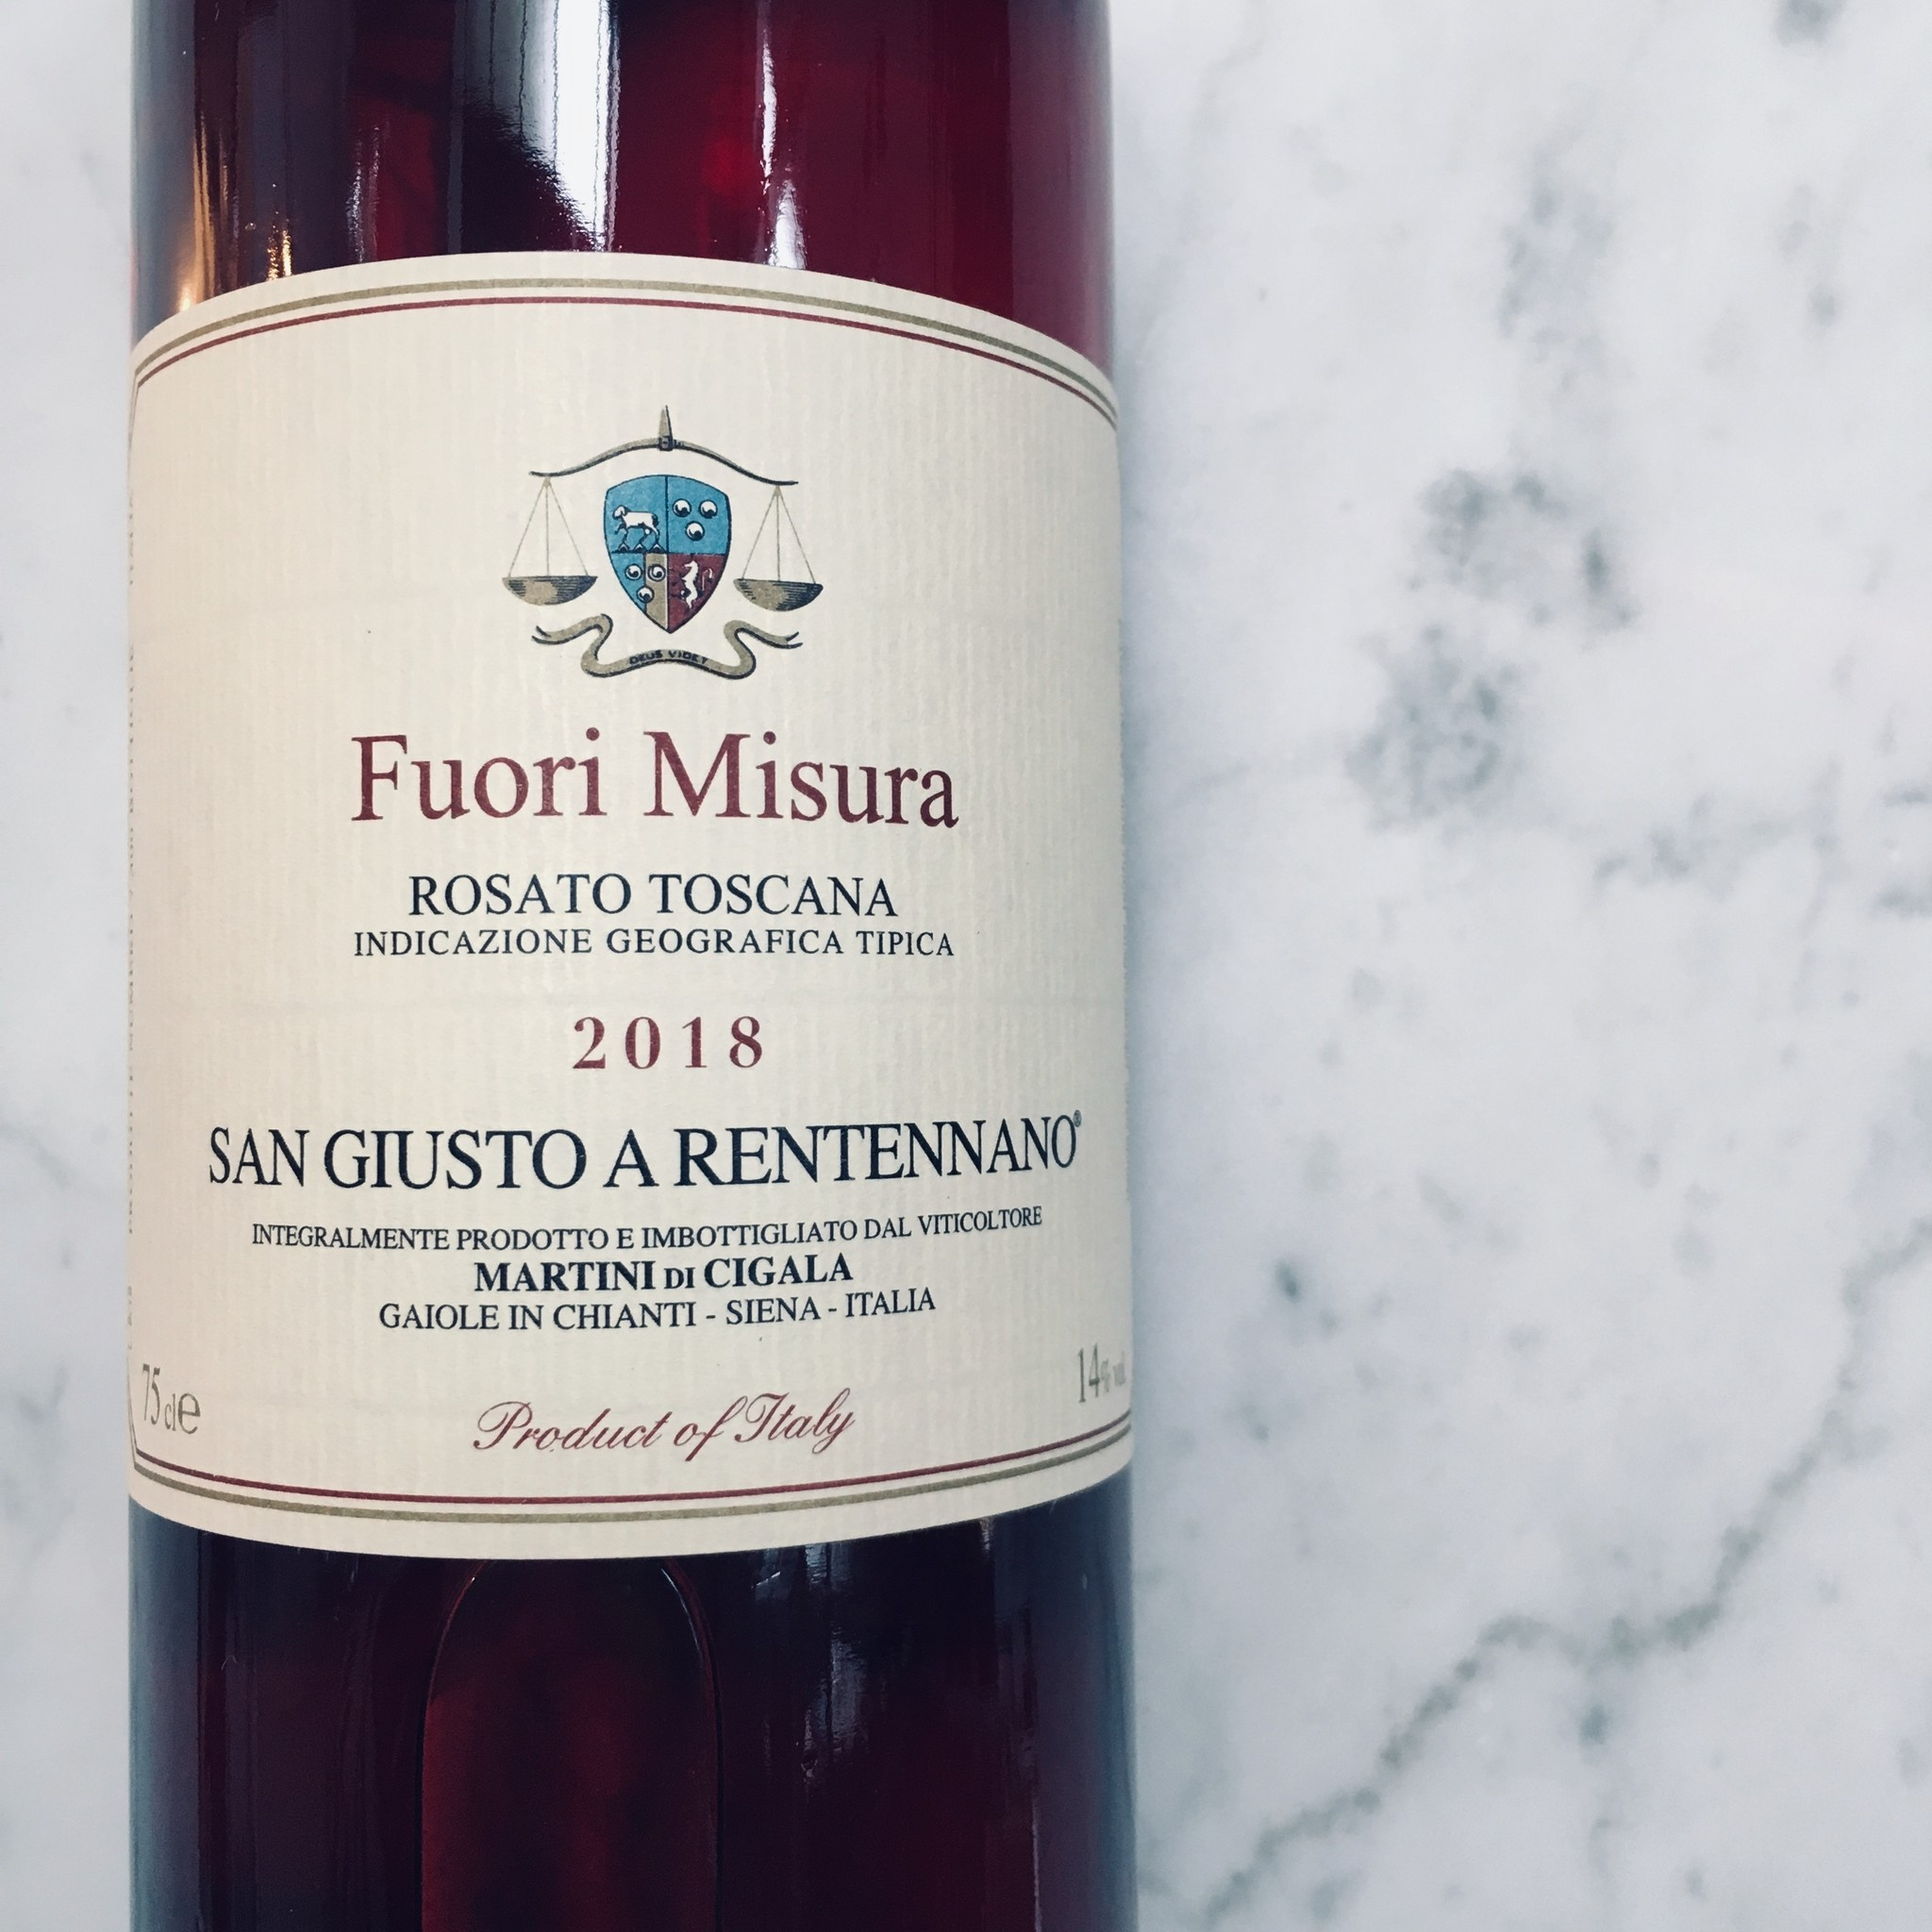 Fuori Misura 2018, Rosato IGT Toscana